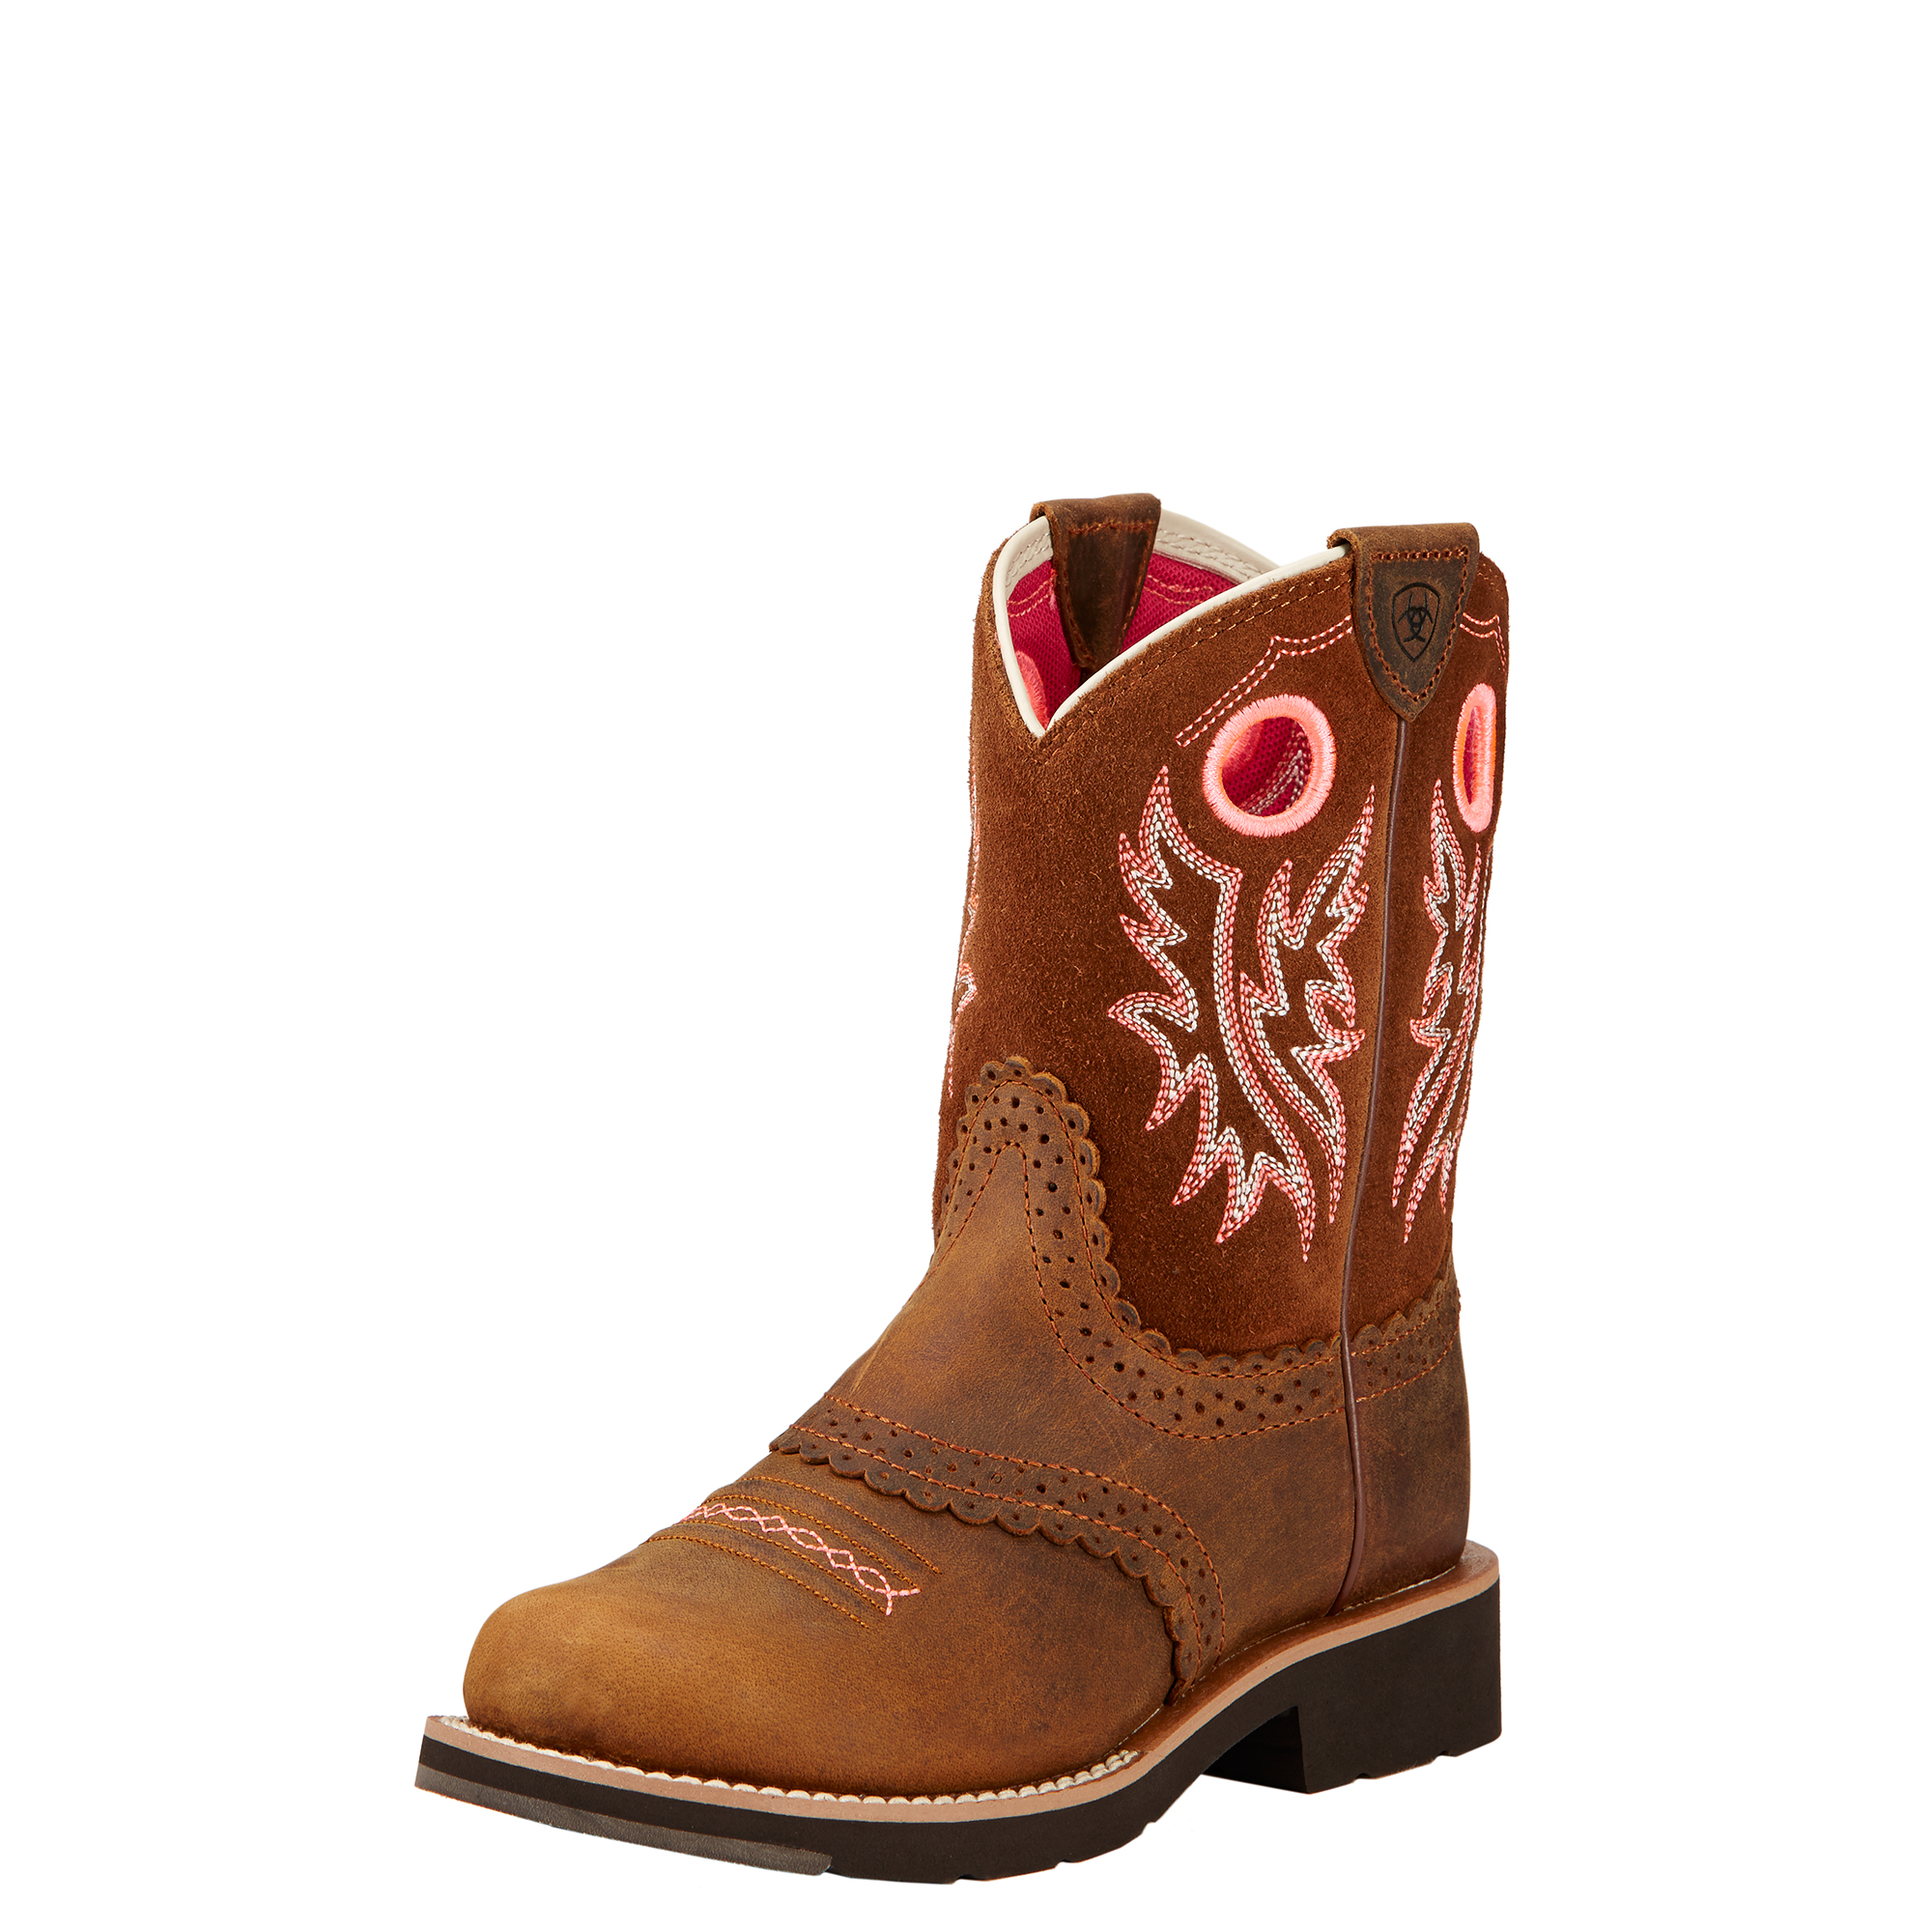 Ariat 10017309 Fatbaby Cowgirl  Powder Brown